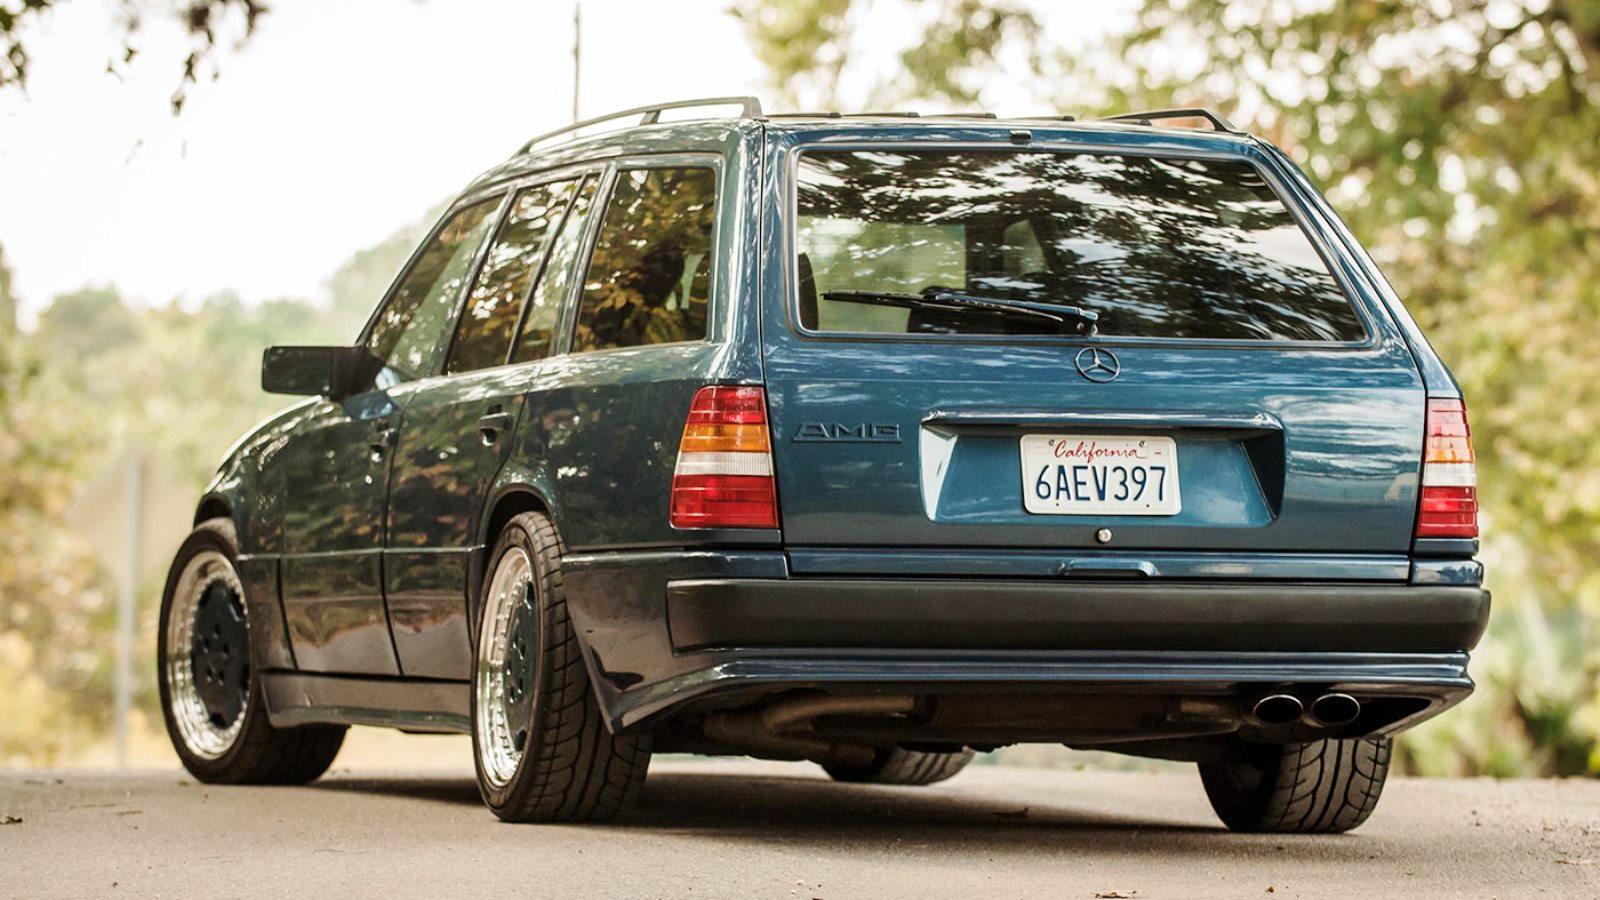 Mercedes-Benz W124 300TE AMG Wagon - The Hammer Wagon